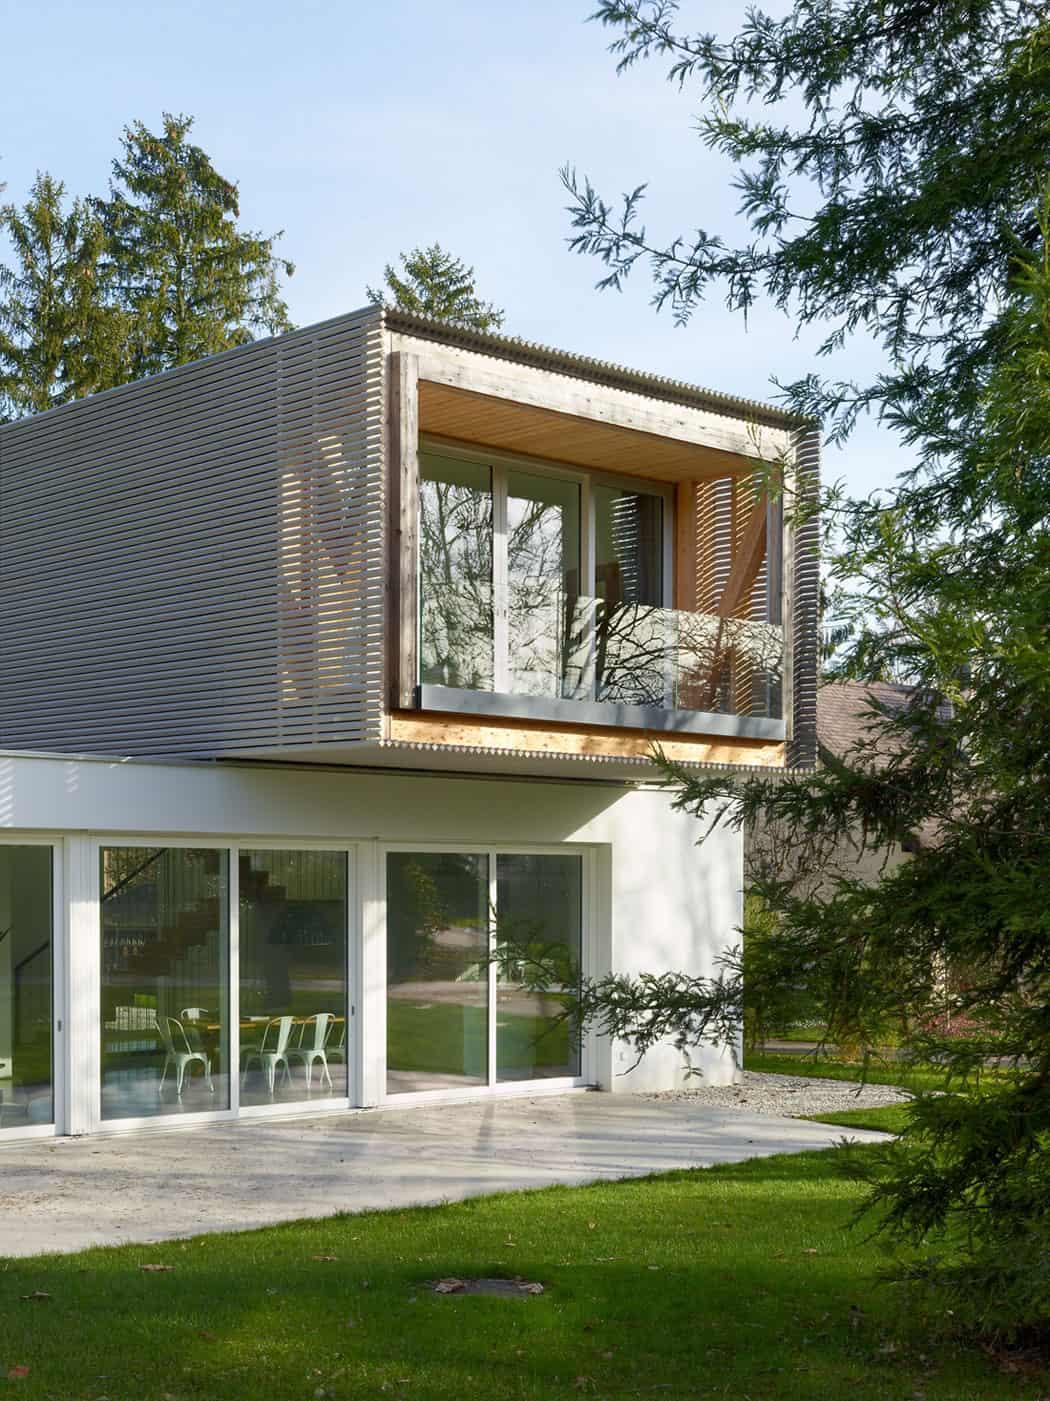 A Single Family House by Christian von Düring architecte (6)